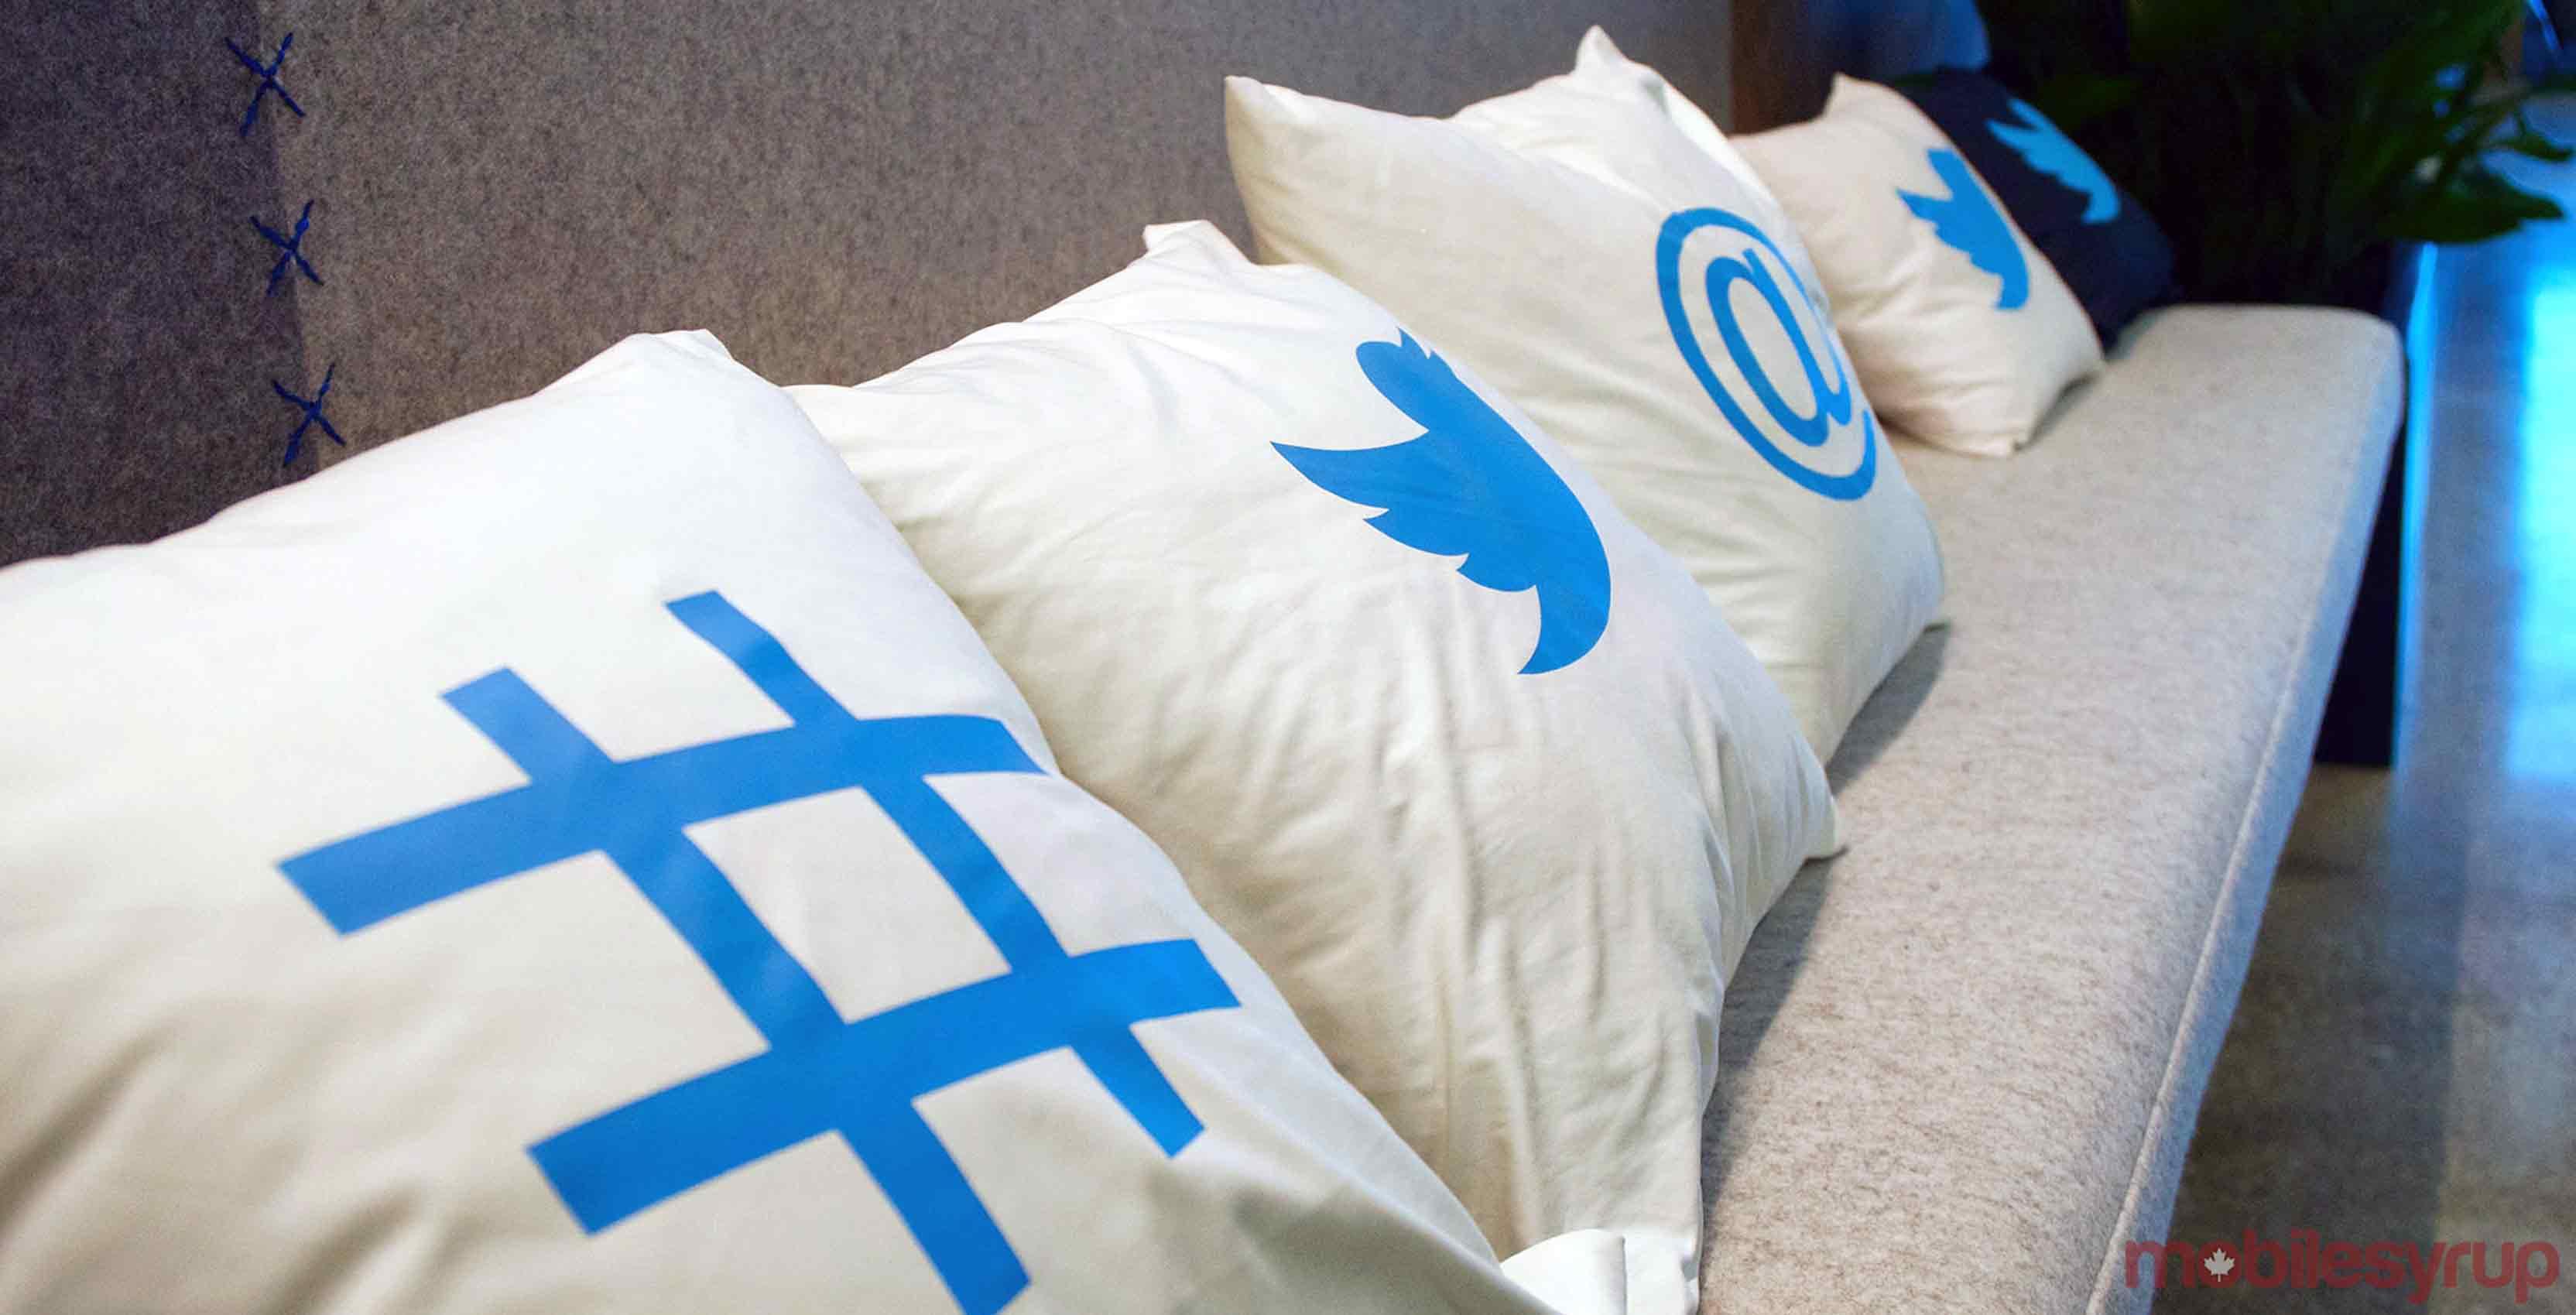 Twitter Canada office pillows